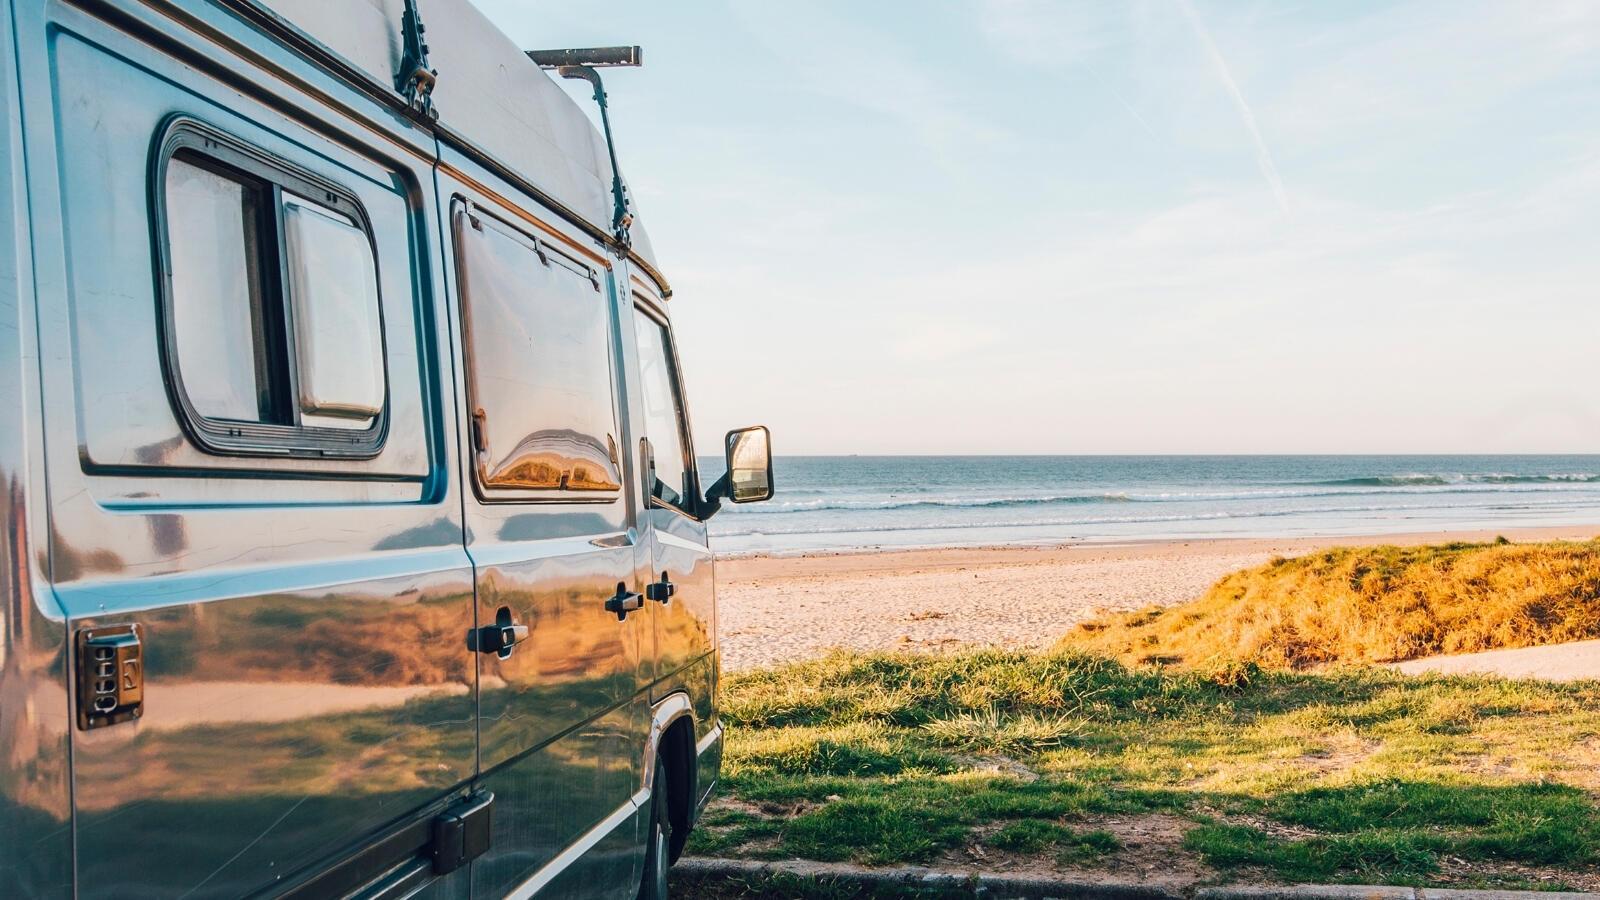 is a campervan break good for kids_